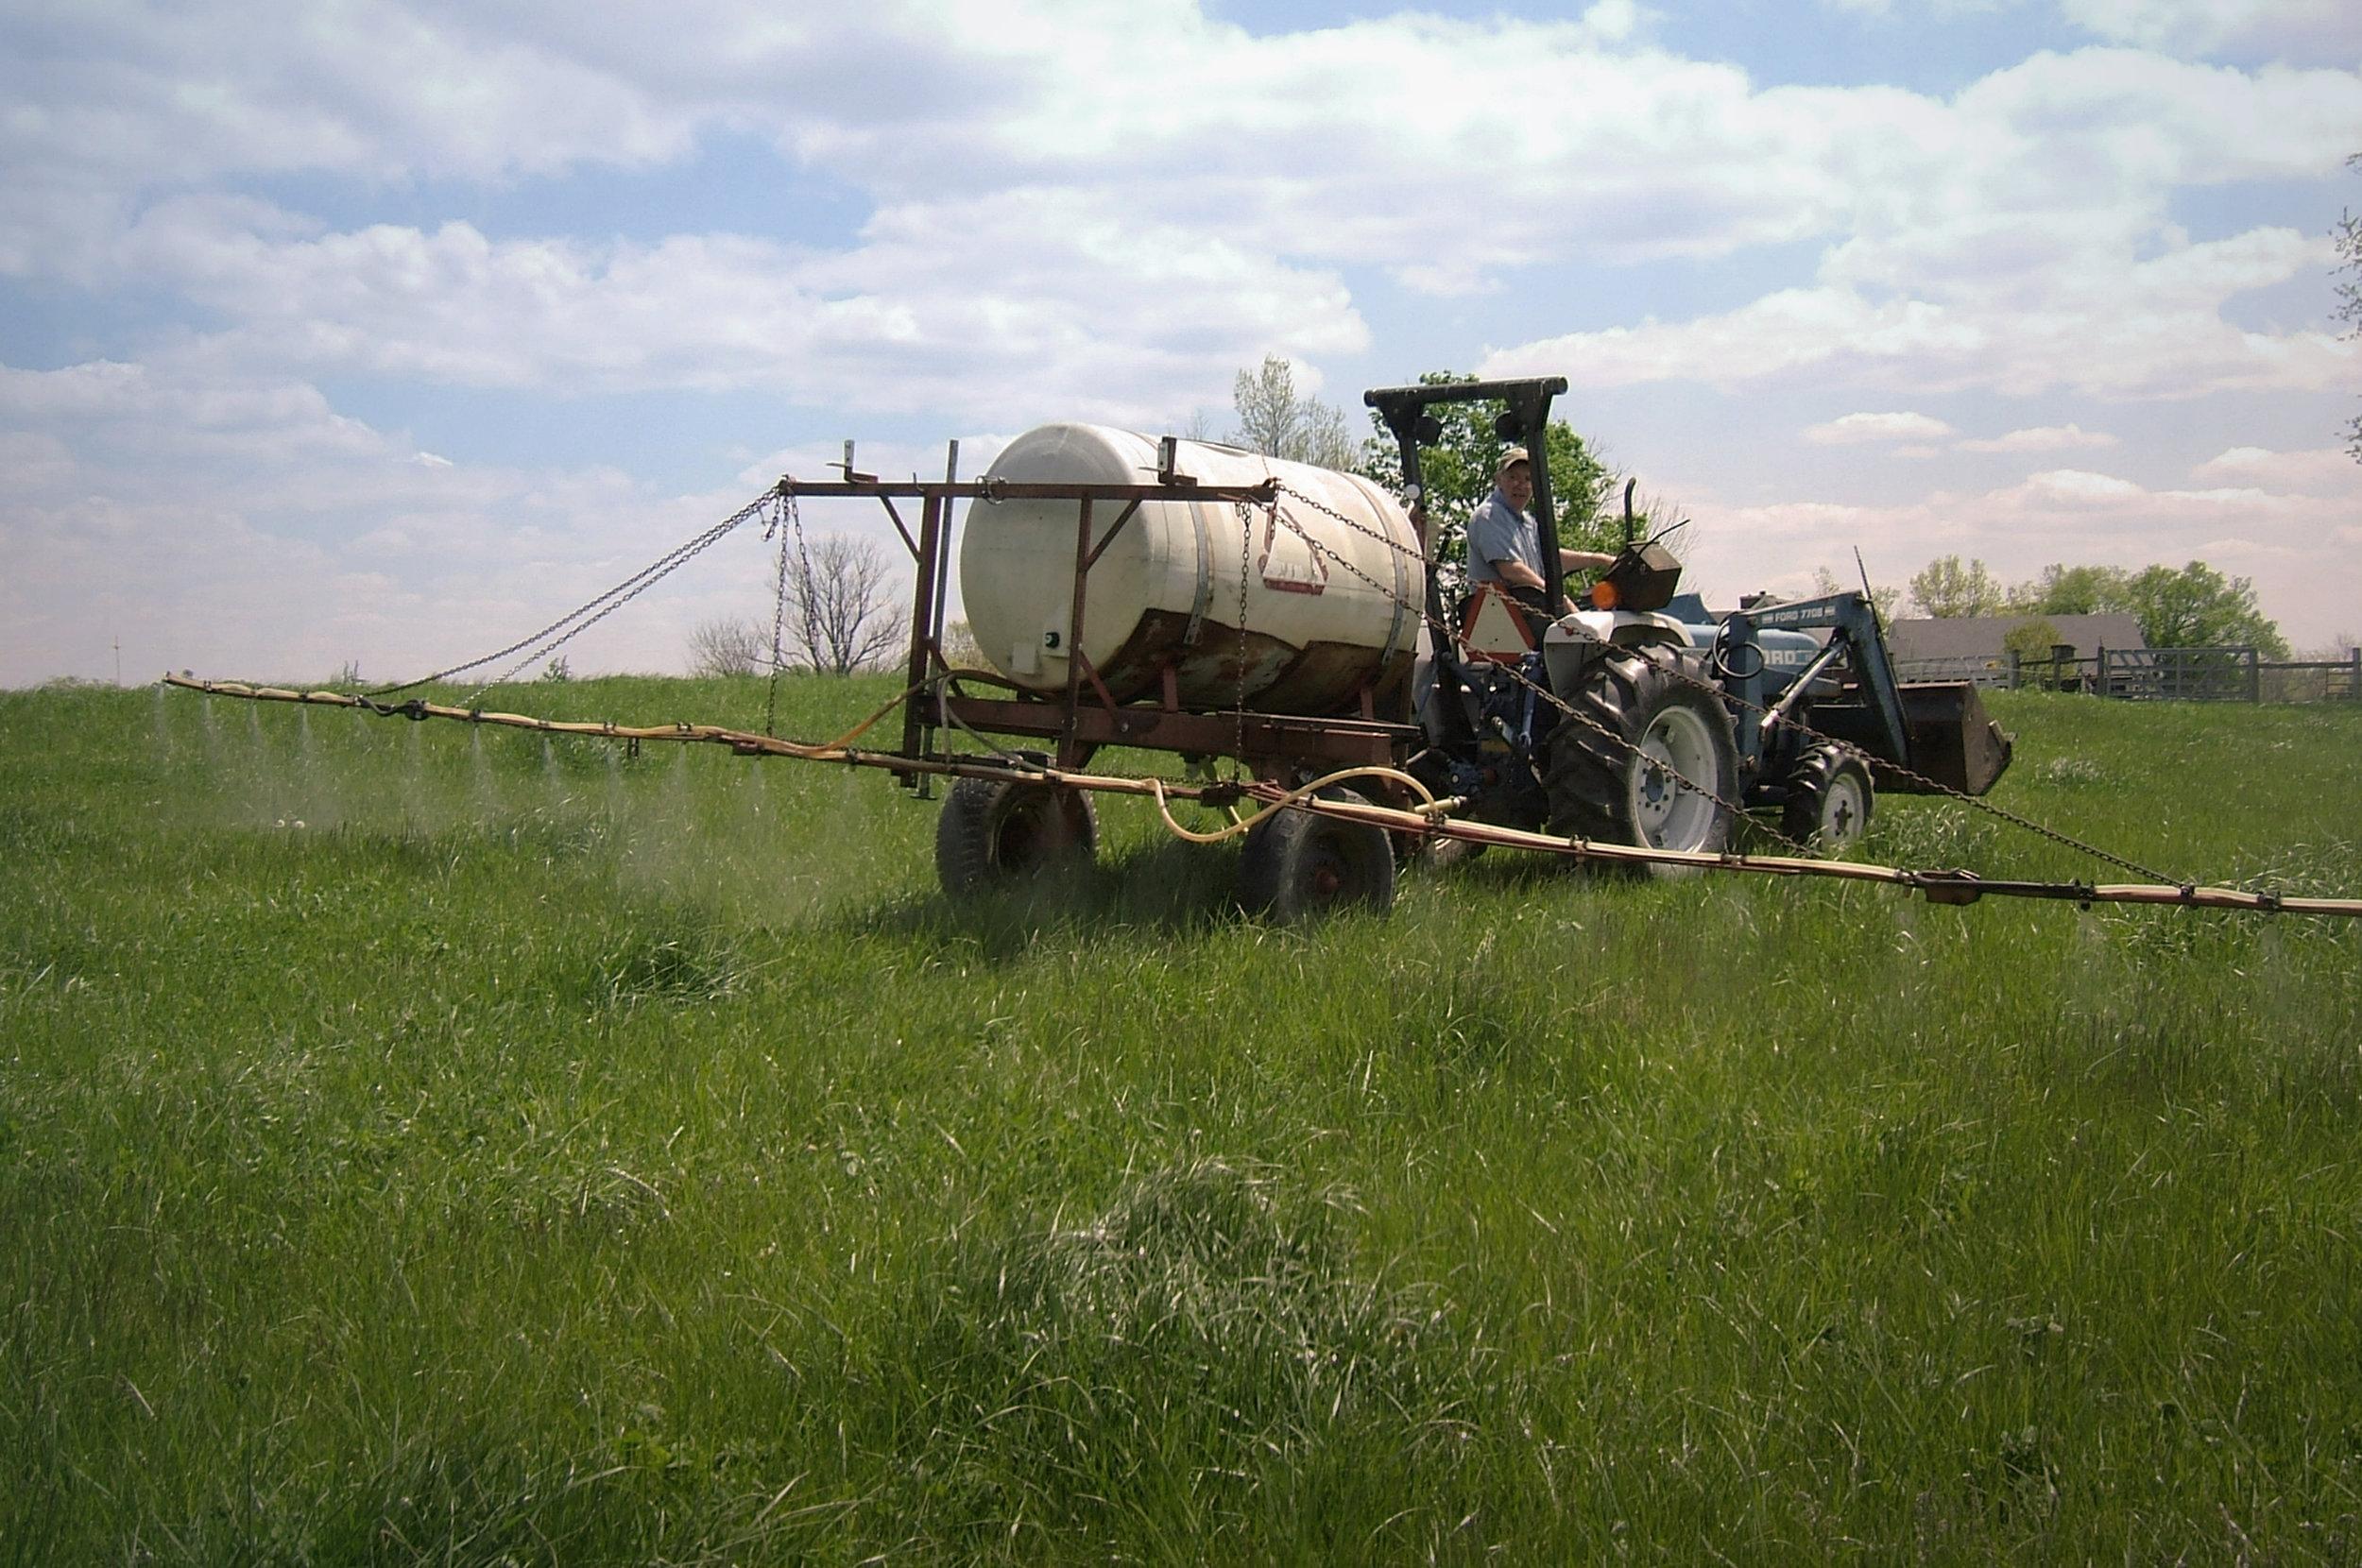 Spraying organic liquid fertilizers on pastures